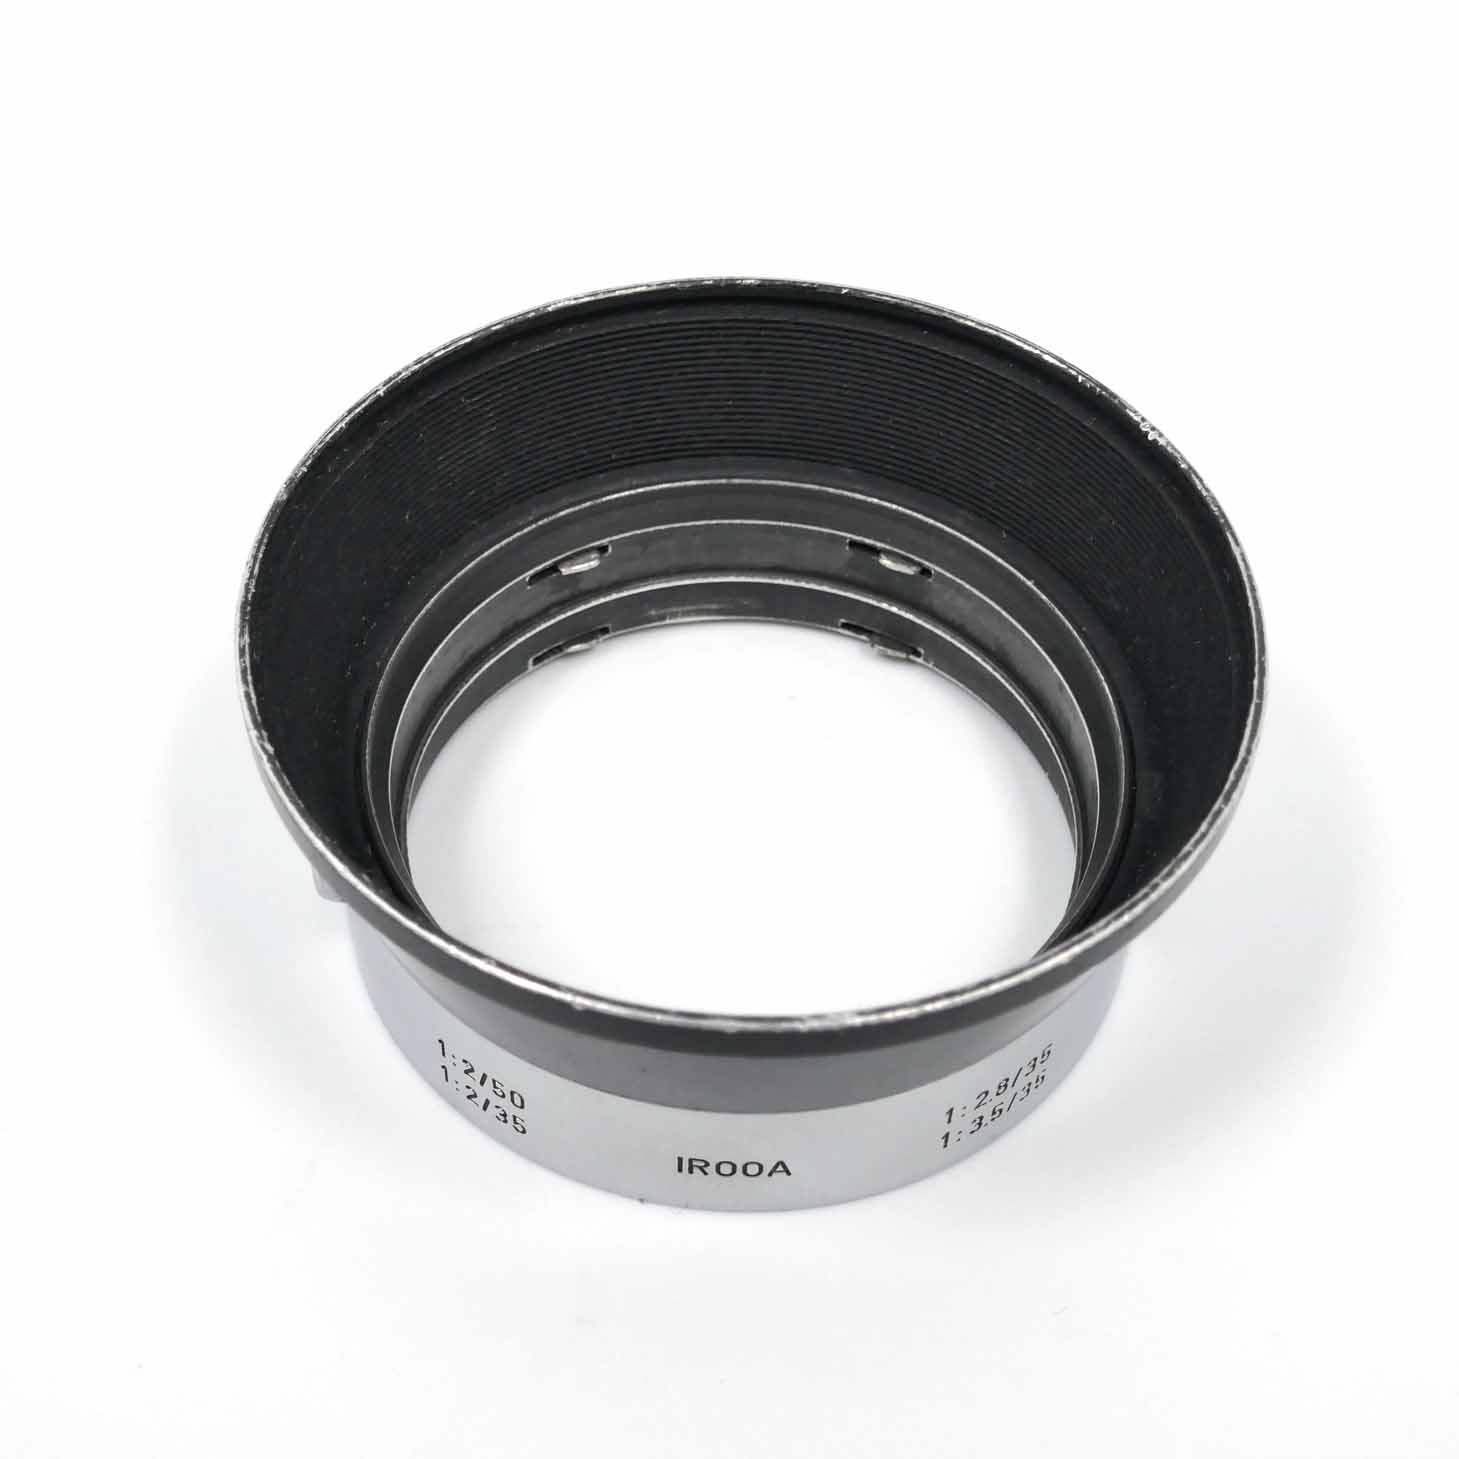 clean-cameras-Leica-IIIg+Summicron-2.0-5cm05